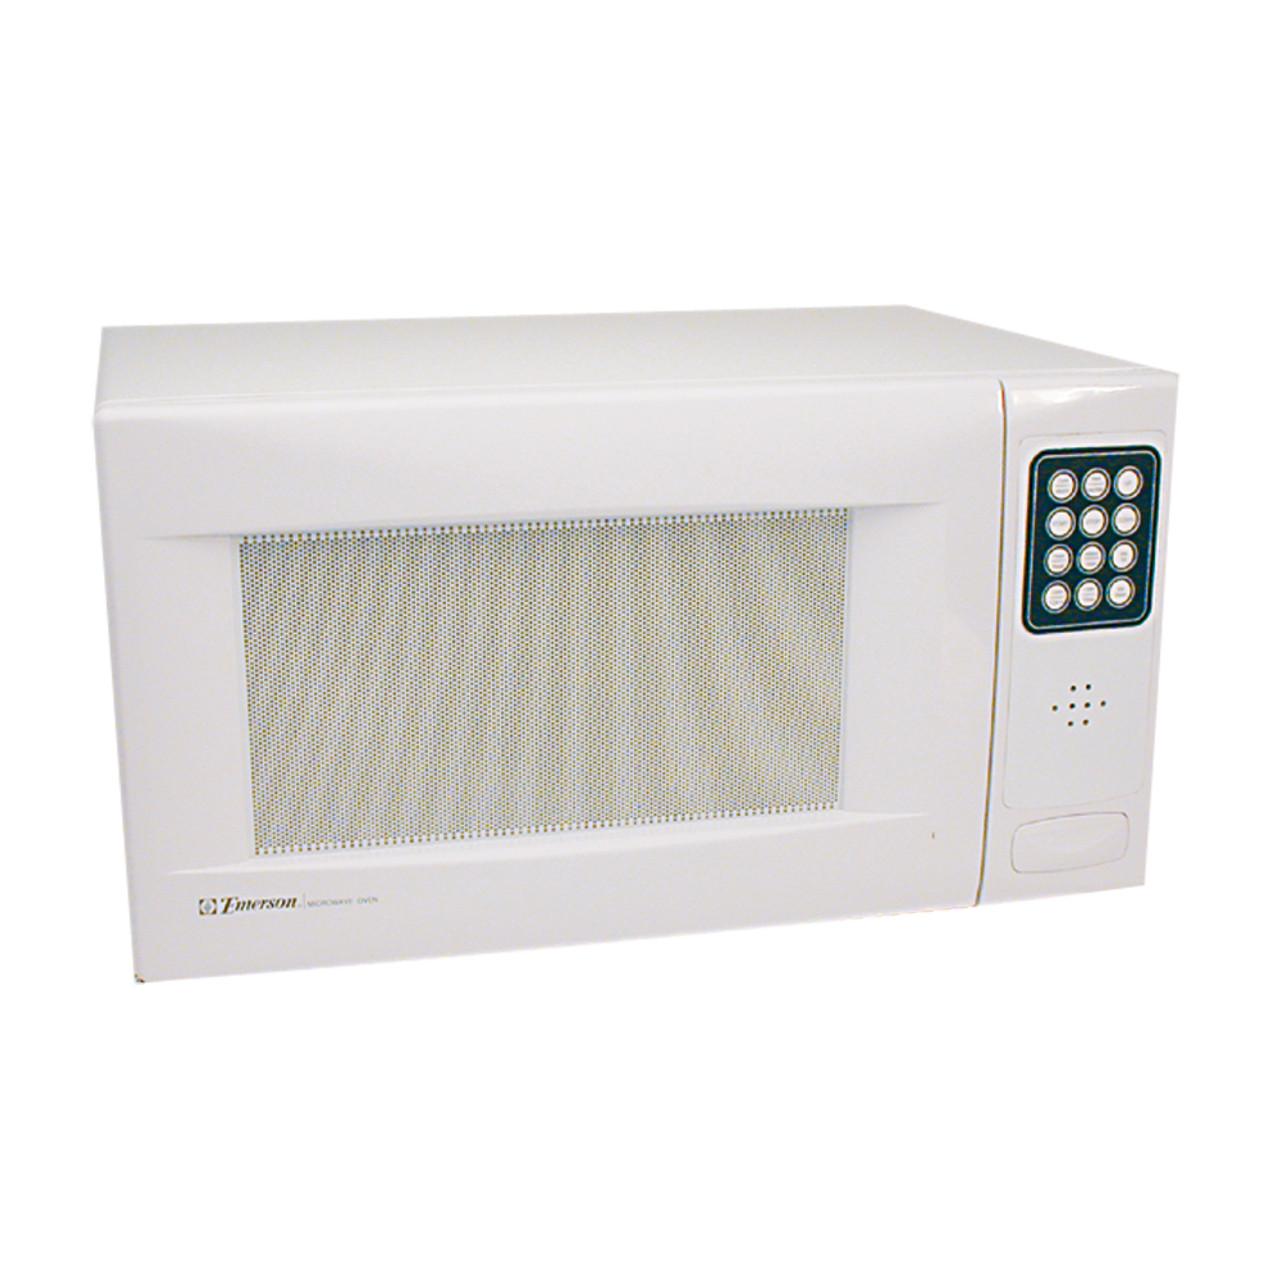 Talking Microwave 1.0 cubic foot capacity